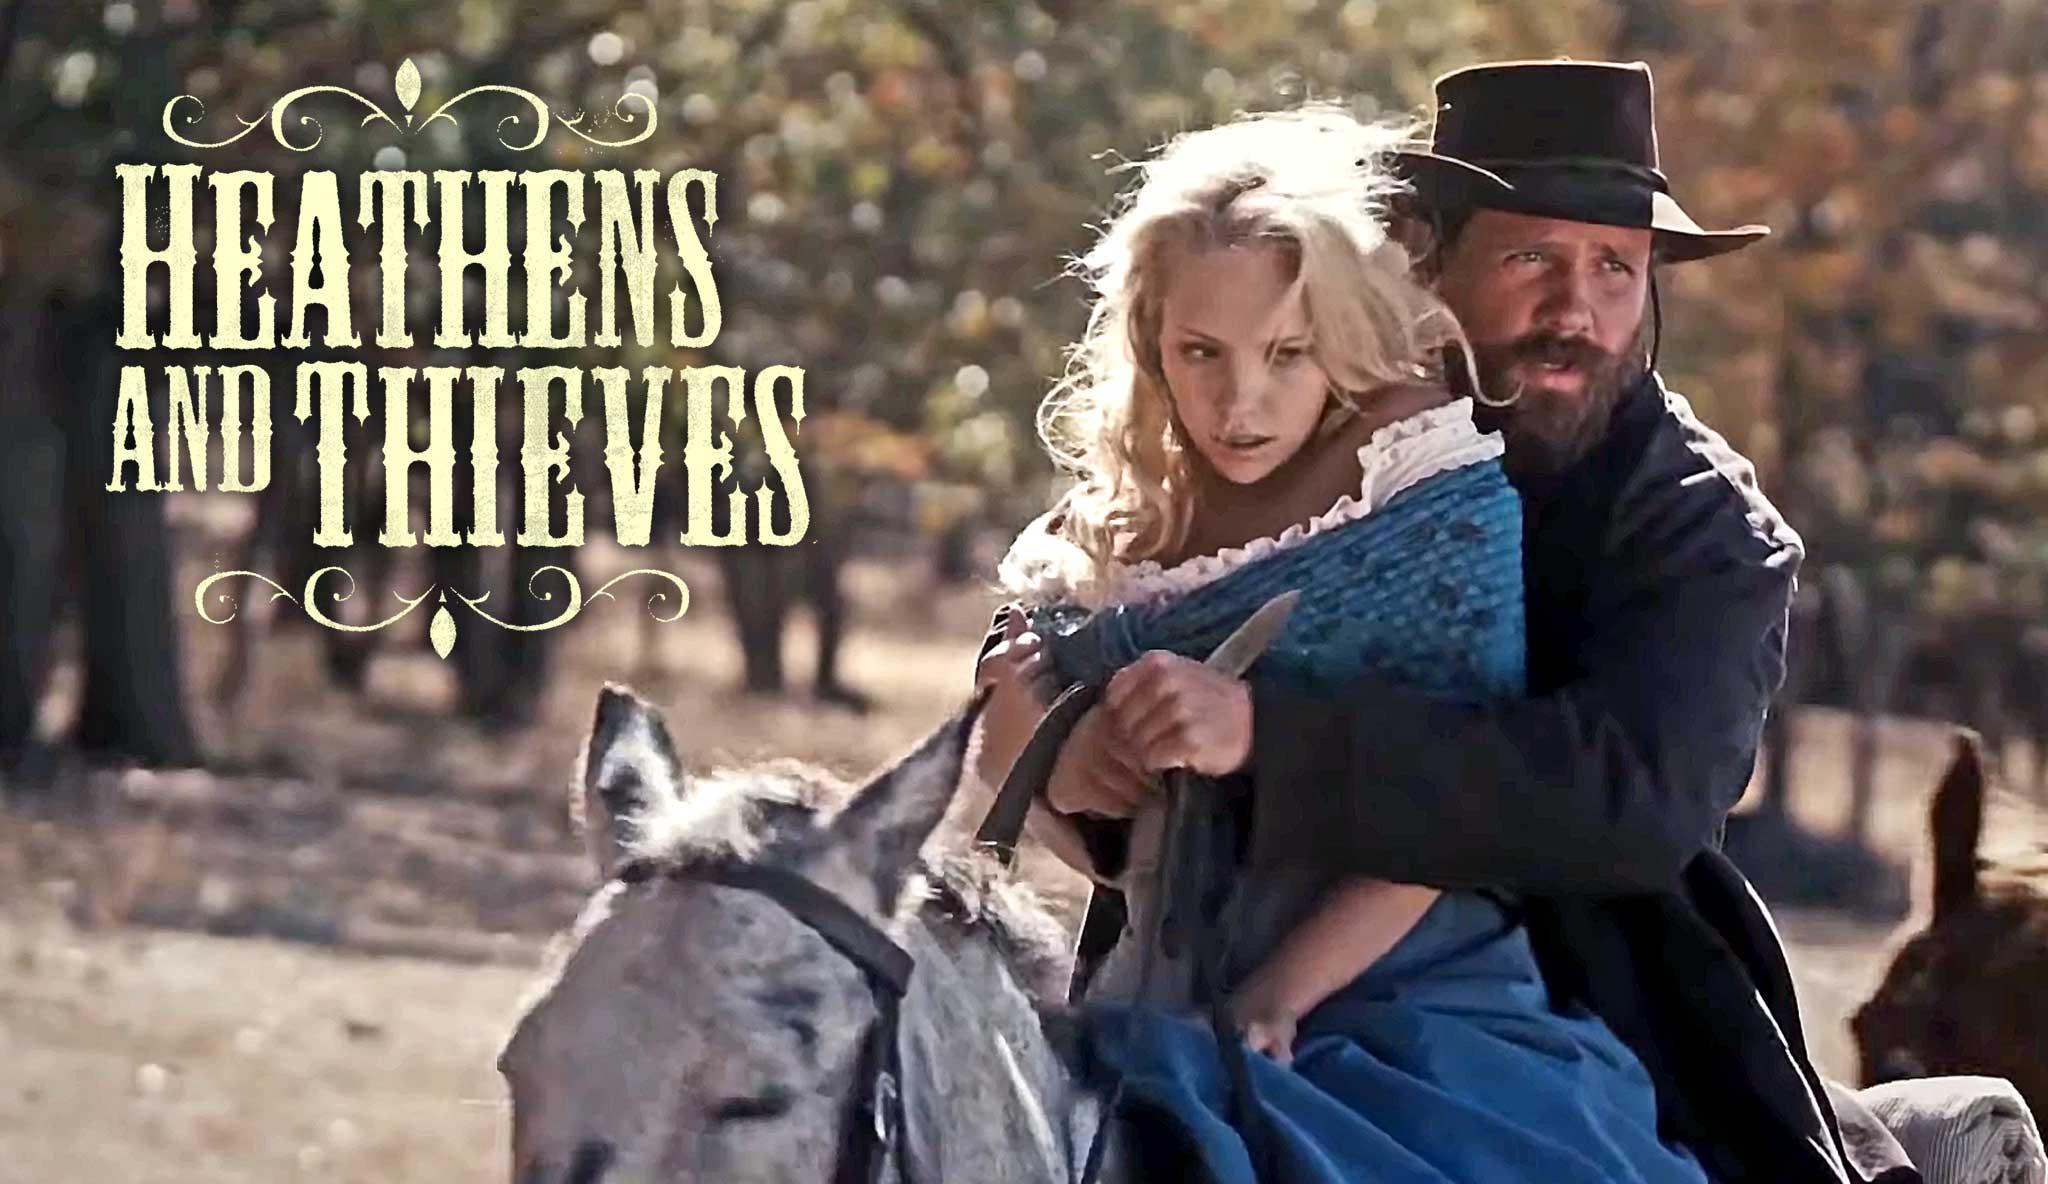 heathens-and-thieves\header.jpg